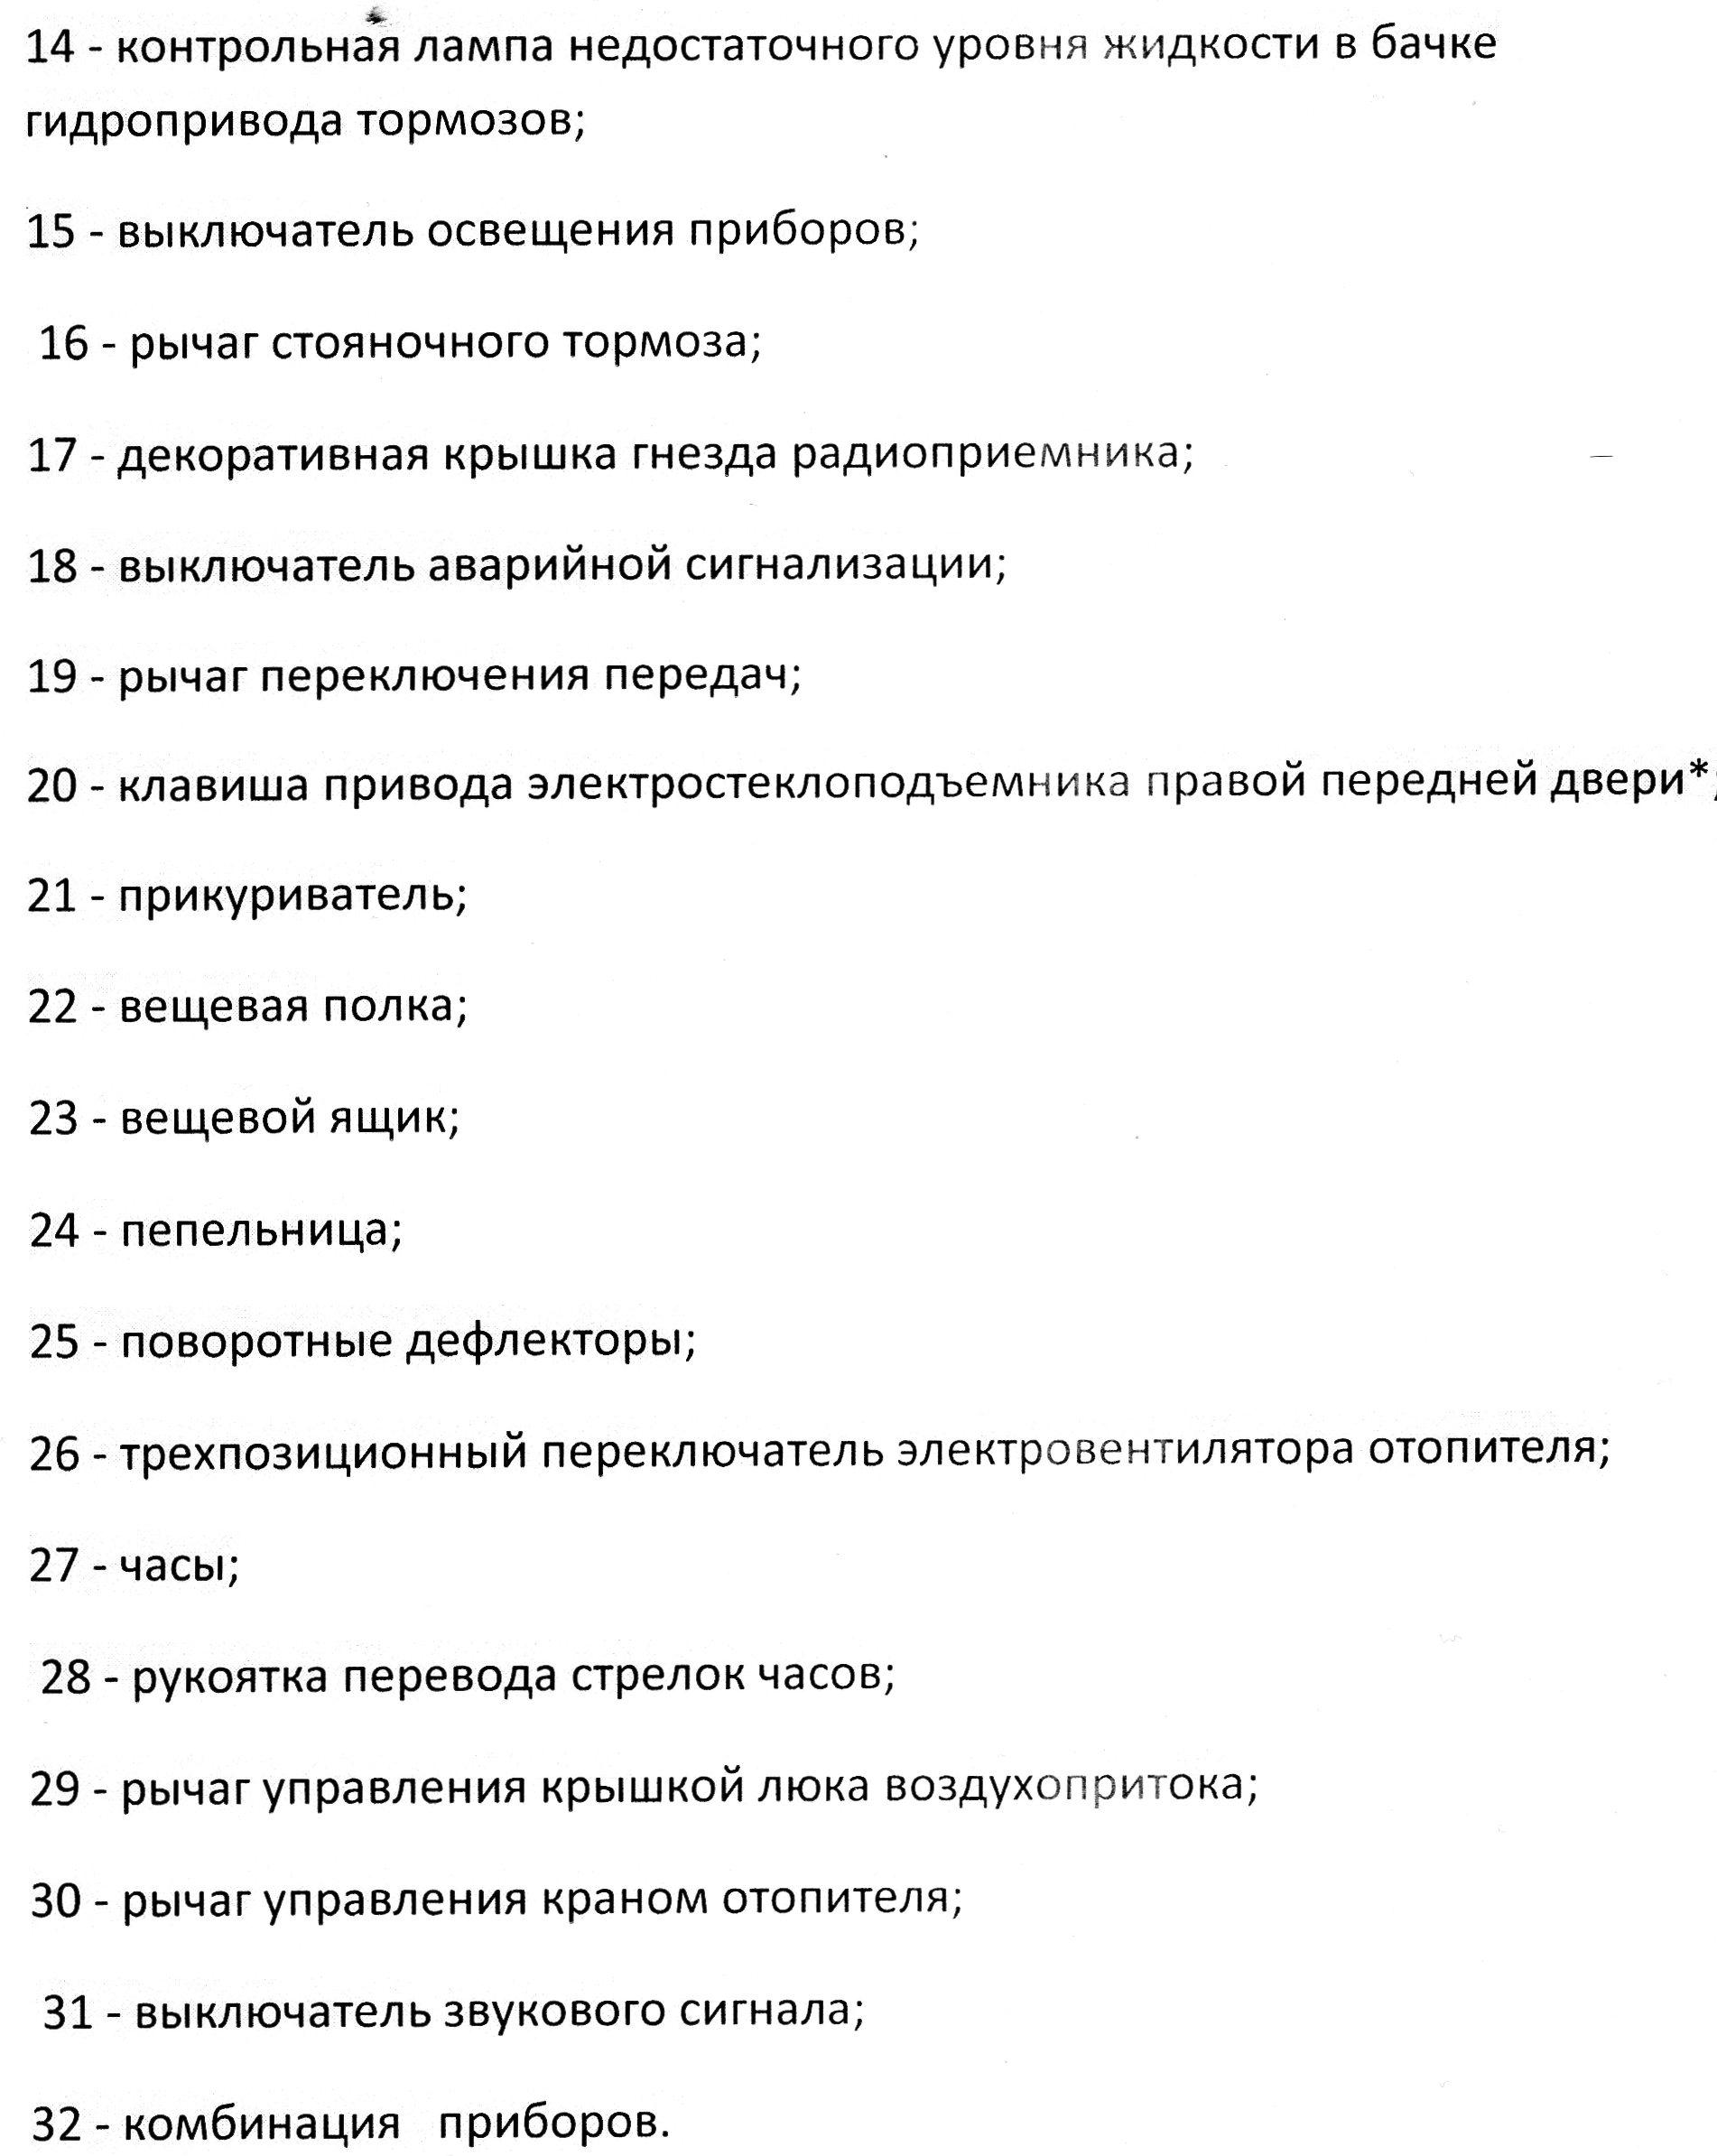 C:\Users\Василий Мельченко\Pictures\img630.jpg